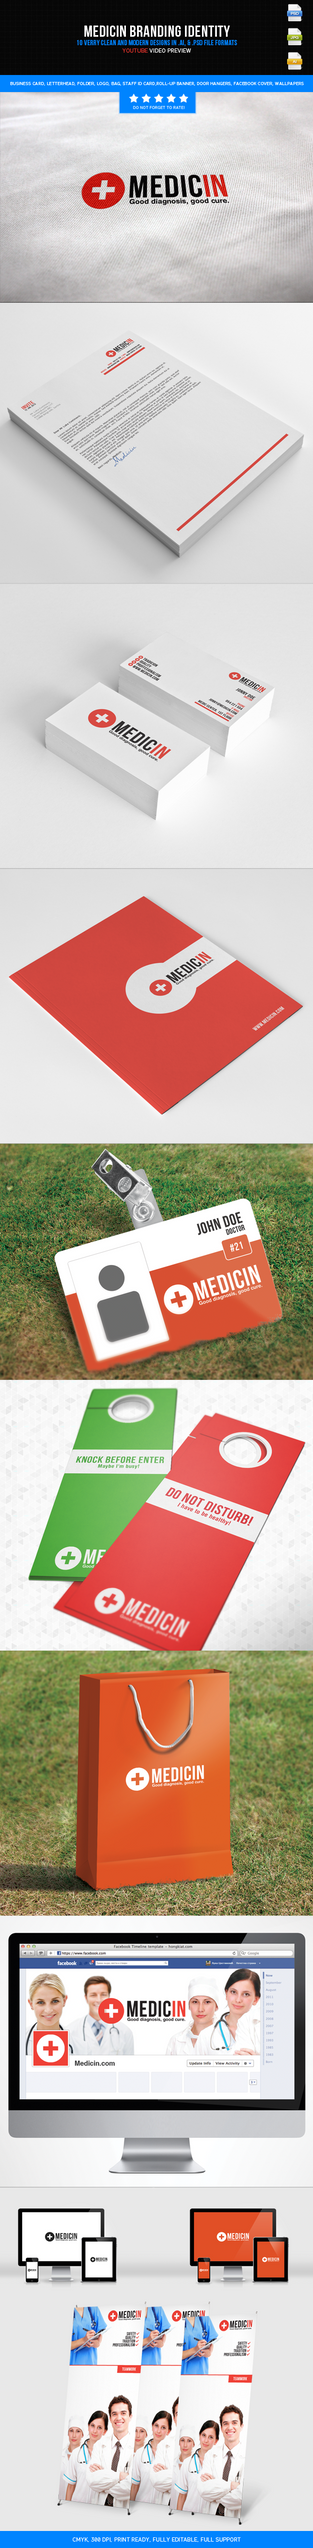 Medicin Branding Identity (Big Pack) by harmonikas996